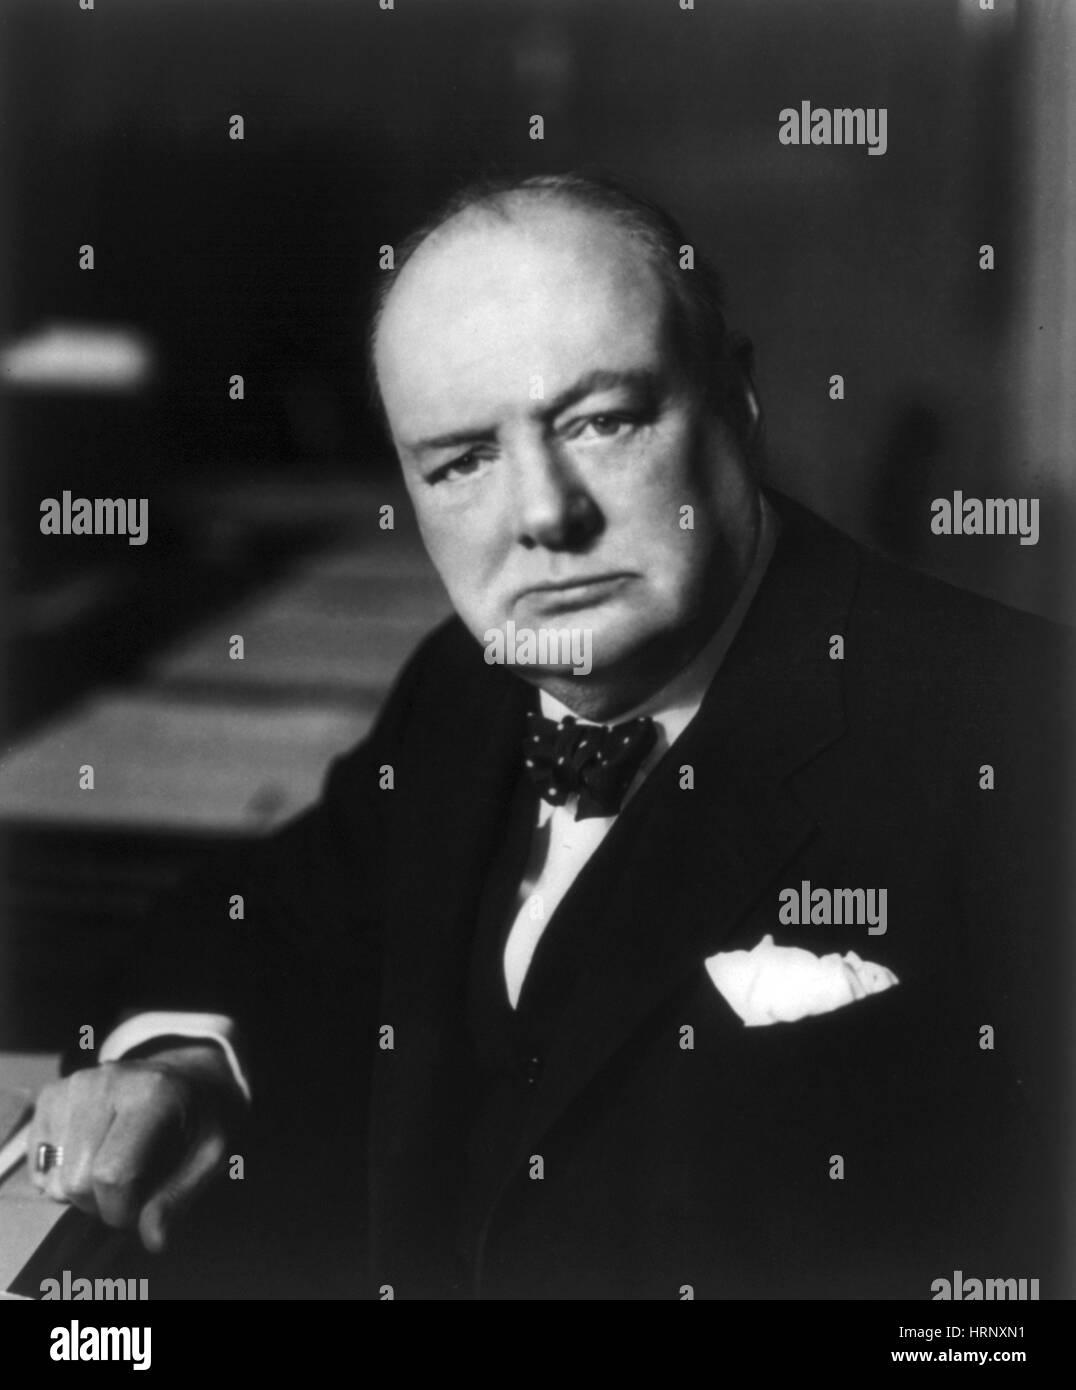 WWII, Winston Churchill, U.K. Prime Minister - Stock Image